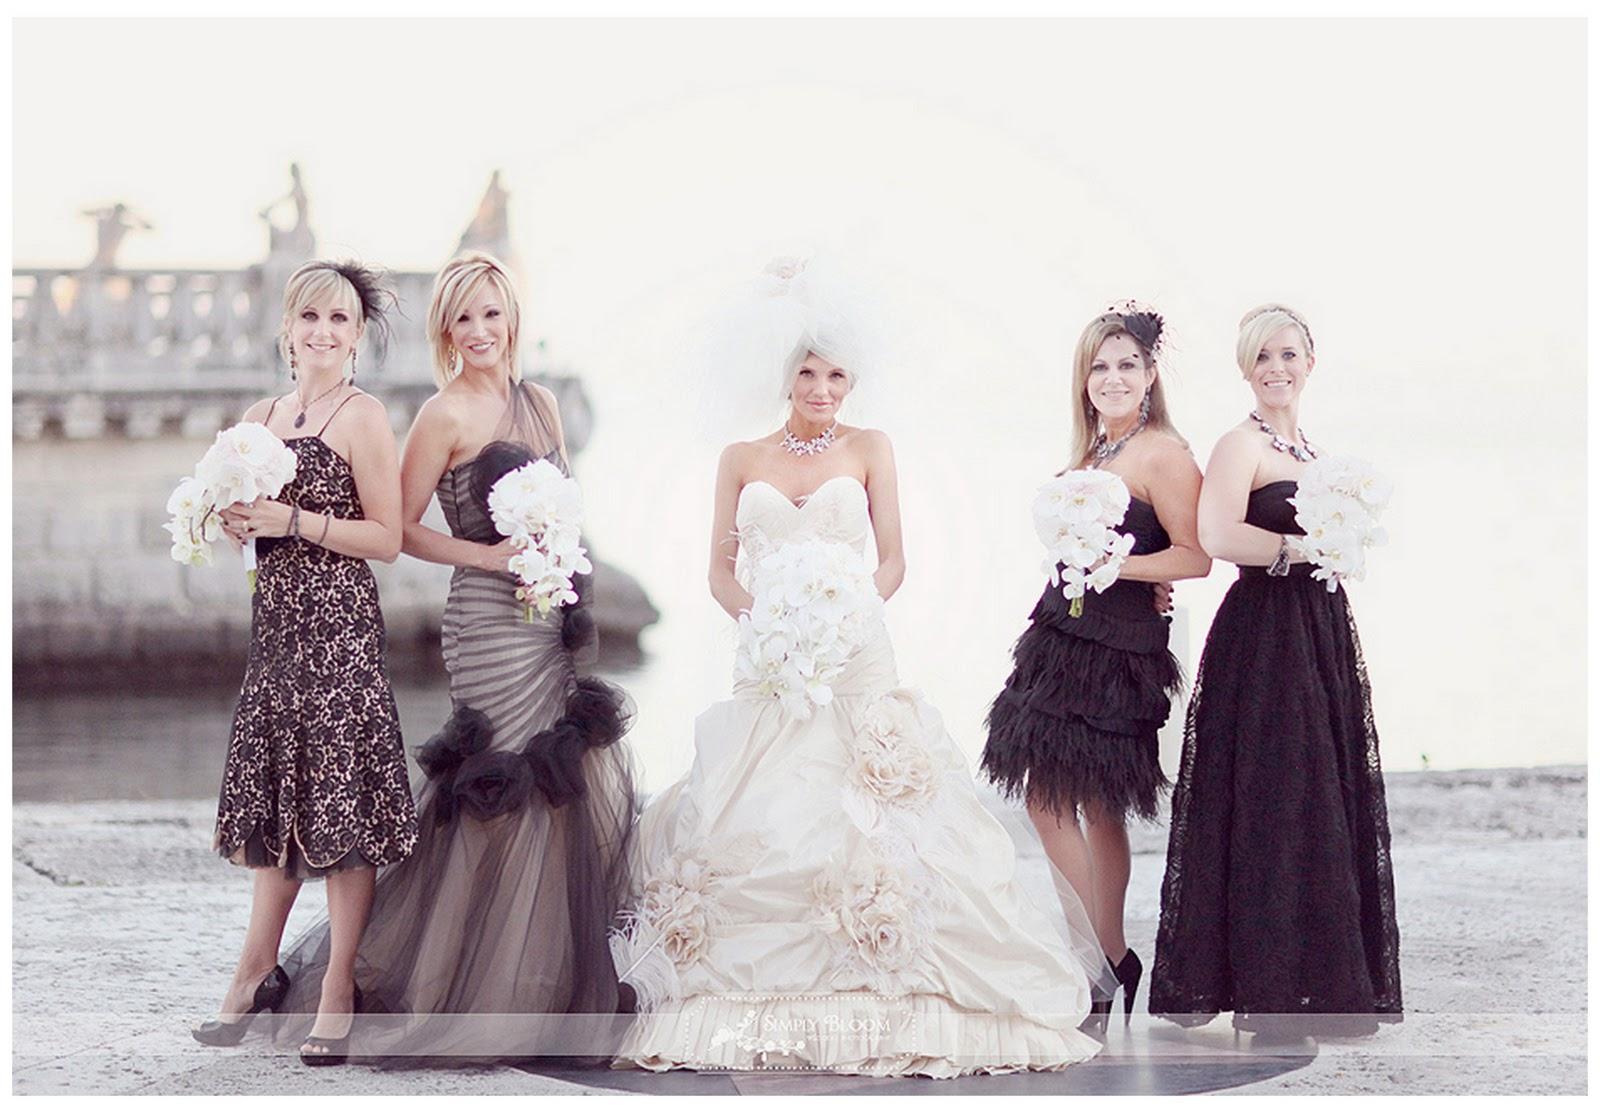 Renaissance Style Wedding Dresses 28 Simple Monday October